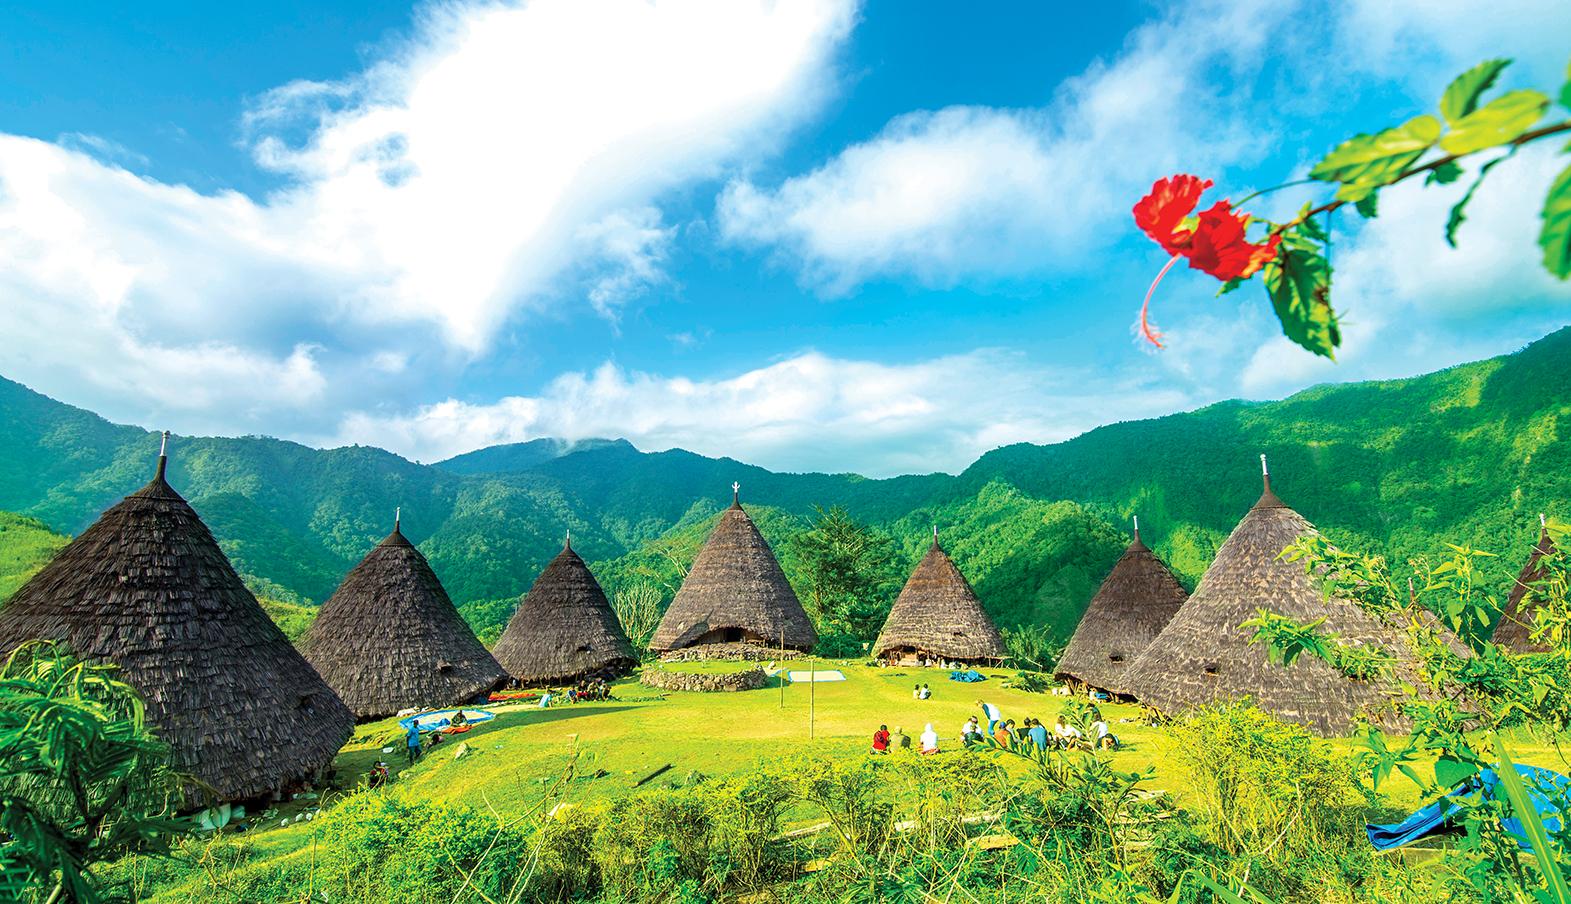 the unique wae rebo village in manggarai flores island